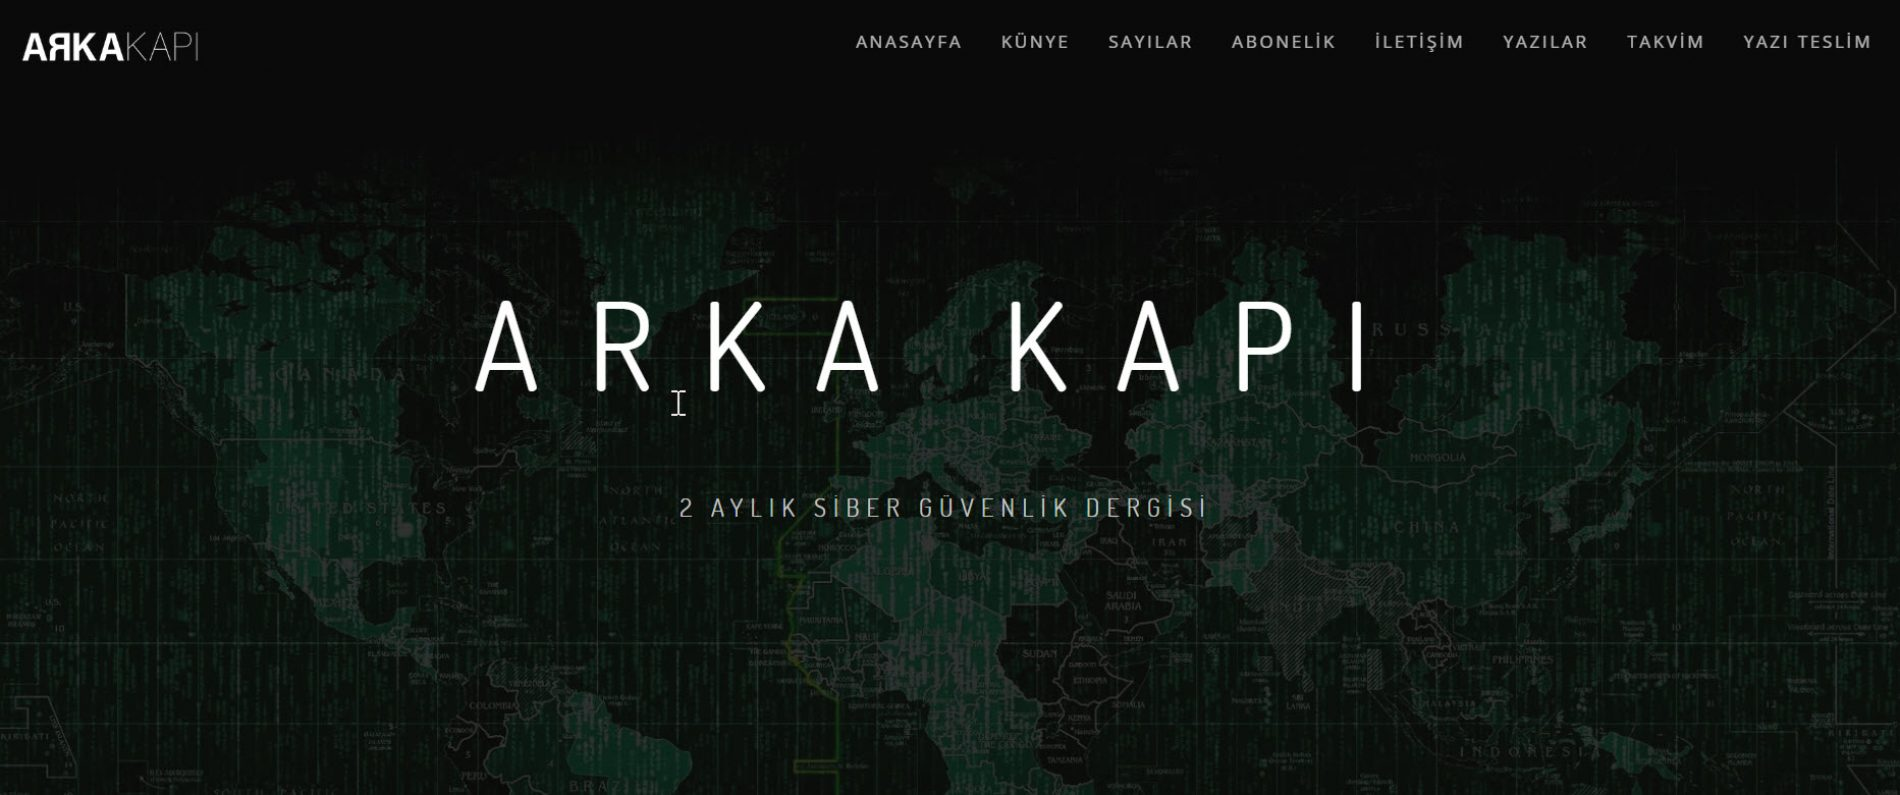 ARKA KAPI : Siber Güvenlik Dergisi